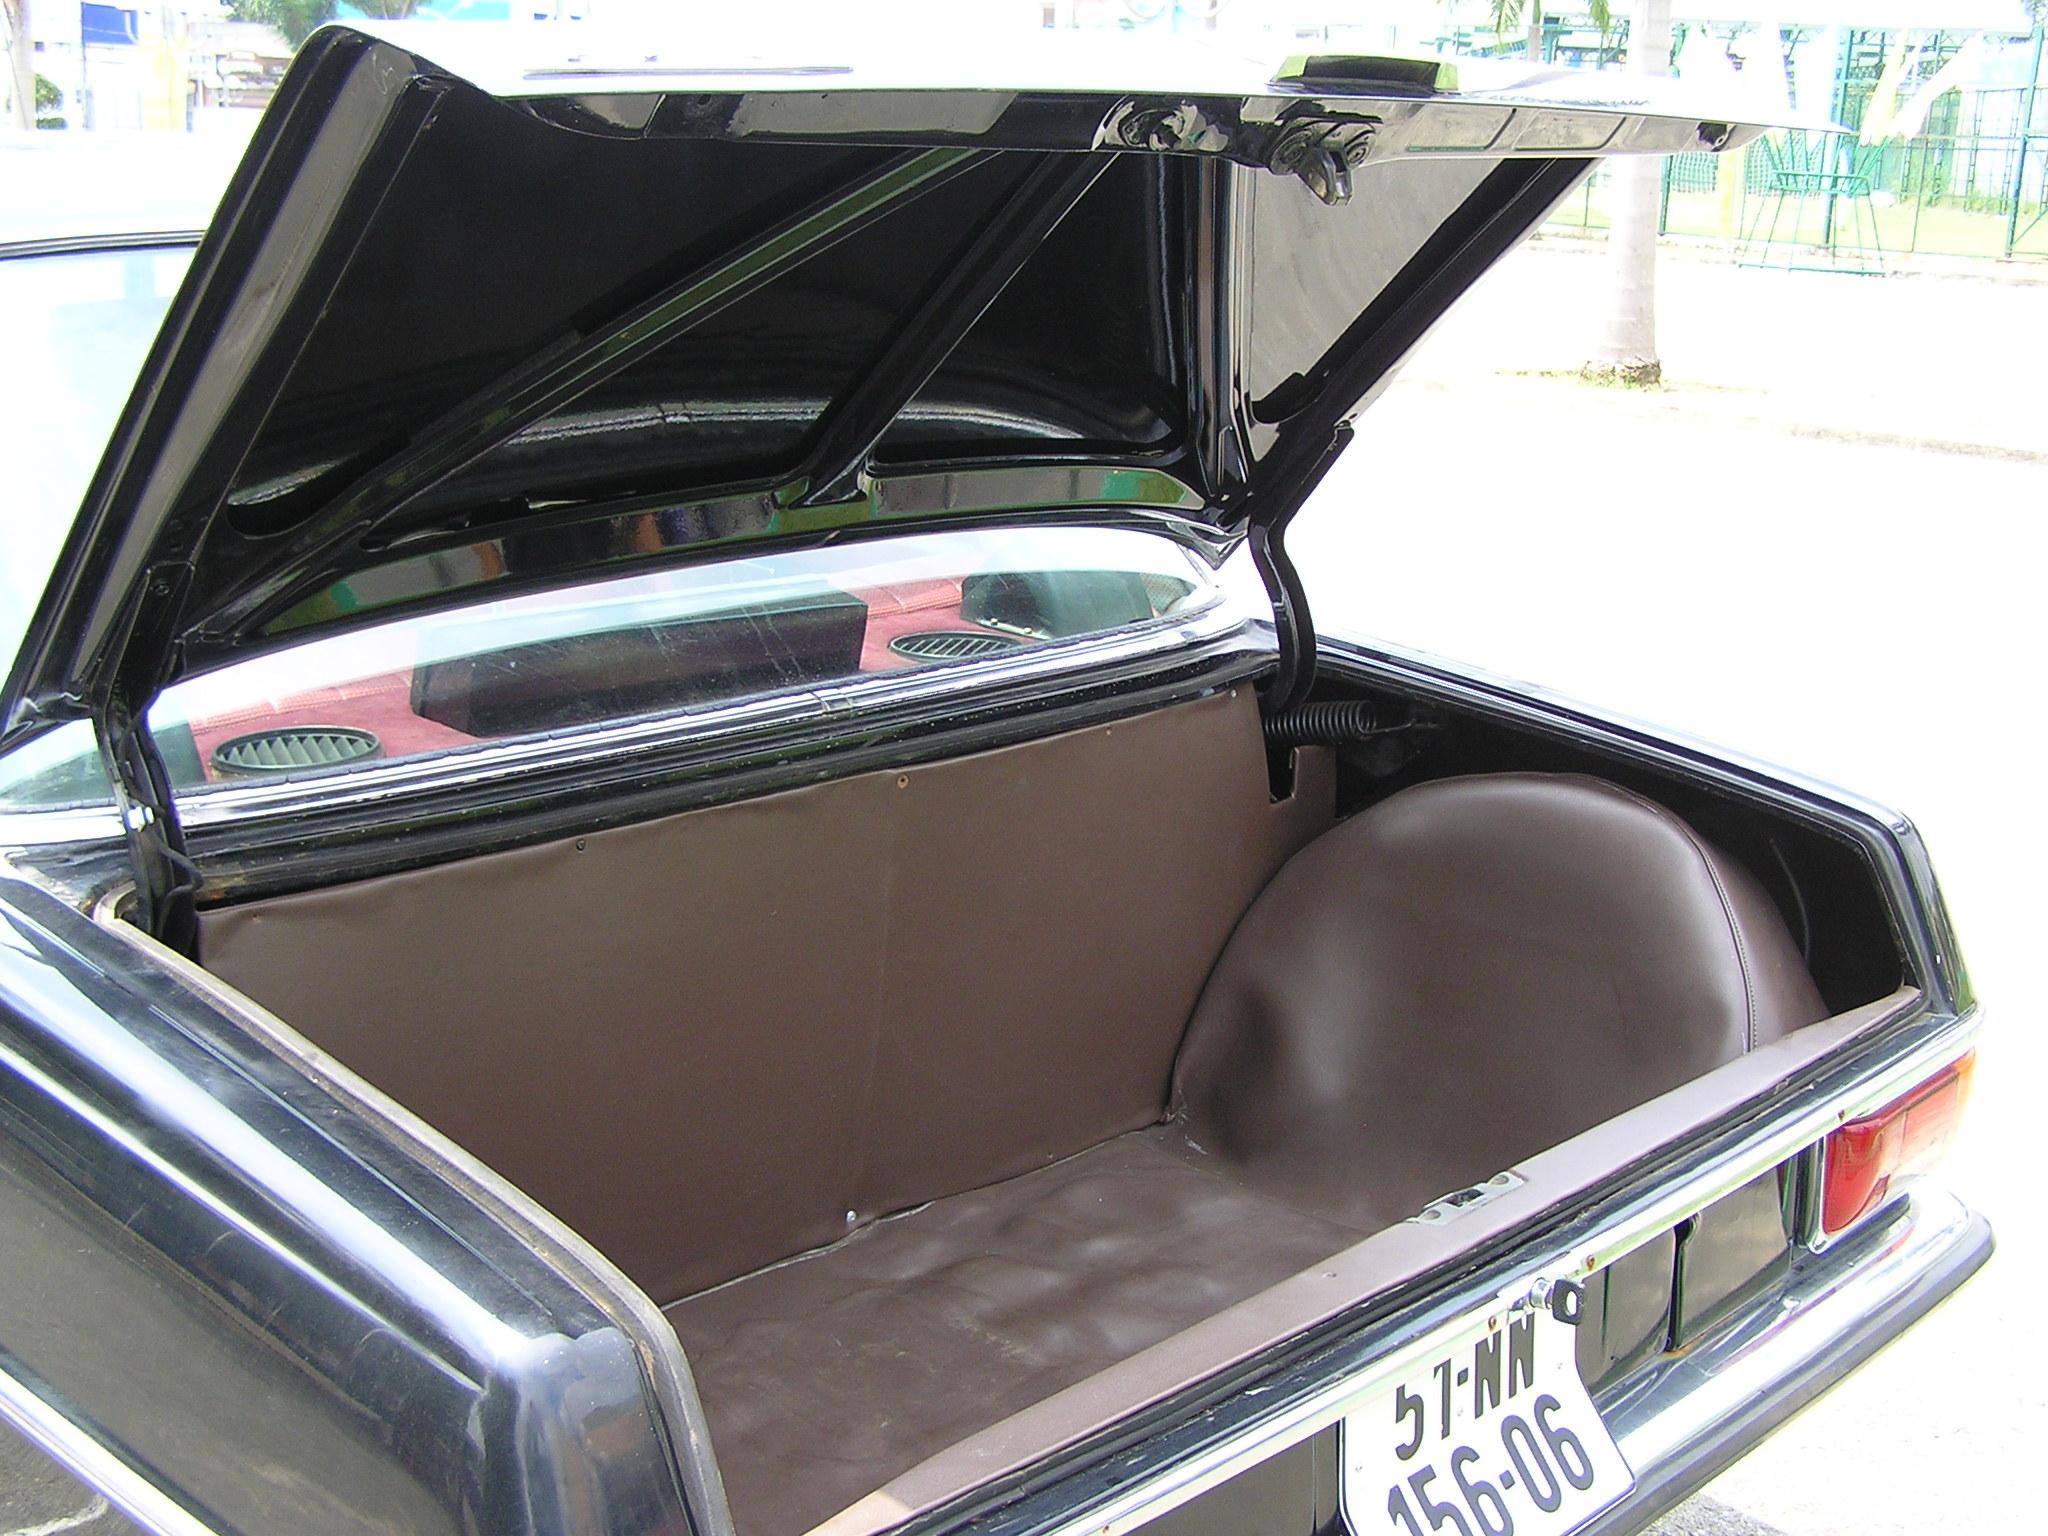 Trai-nghiem-qua-khu-ngot-ngao-tren-Mercedes-Benz-Limousine-230E-1969-anh-20